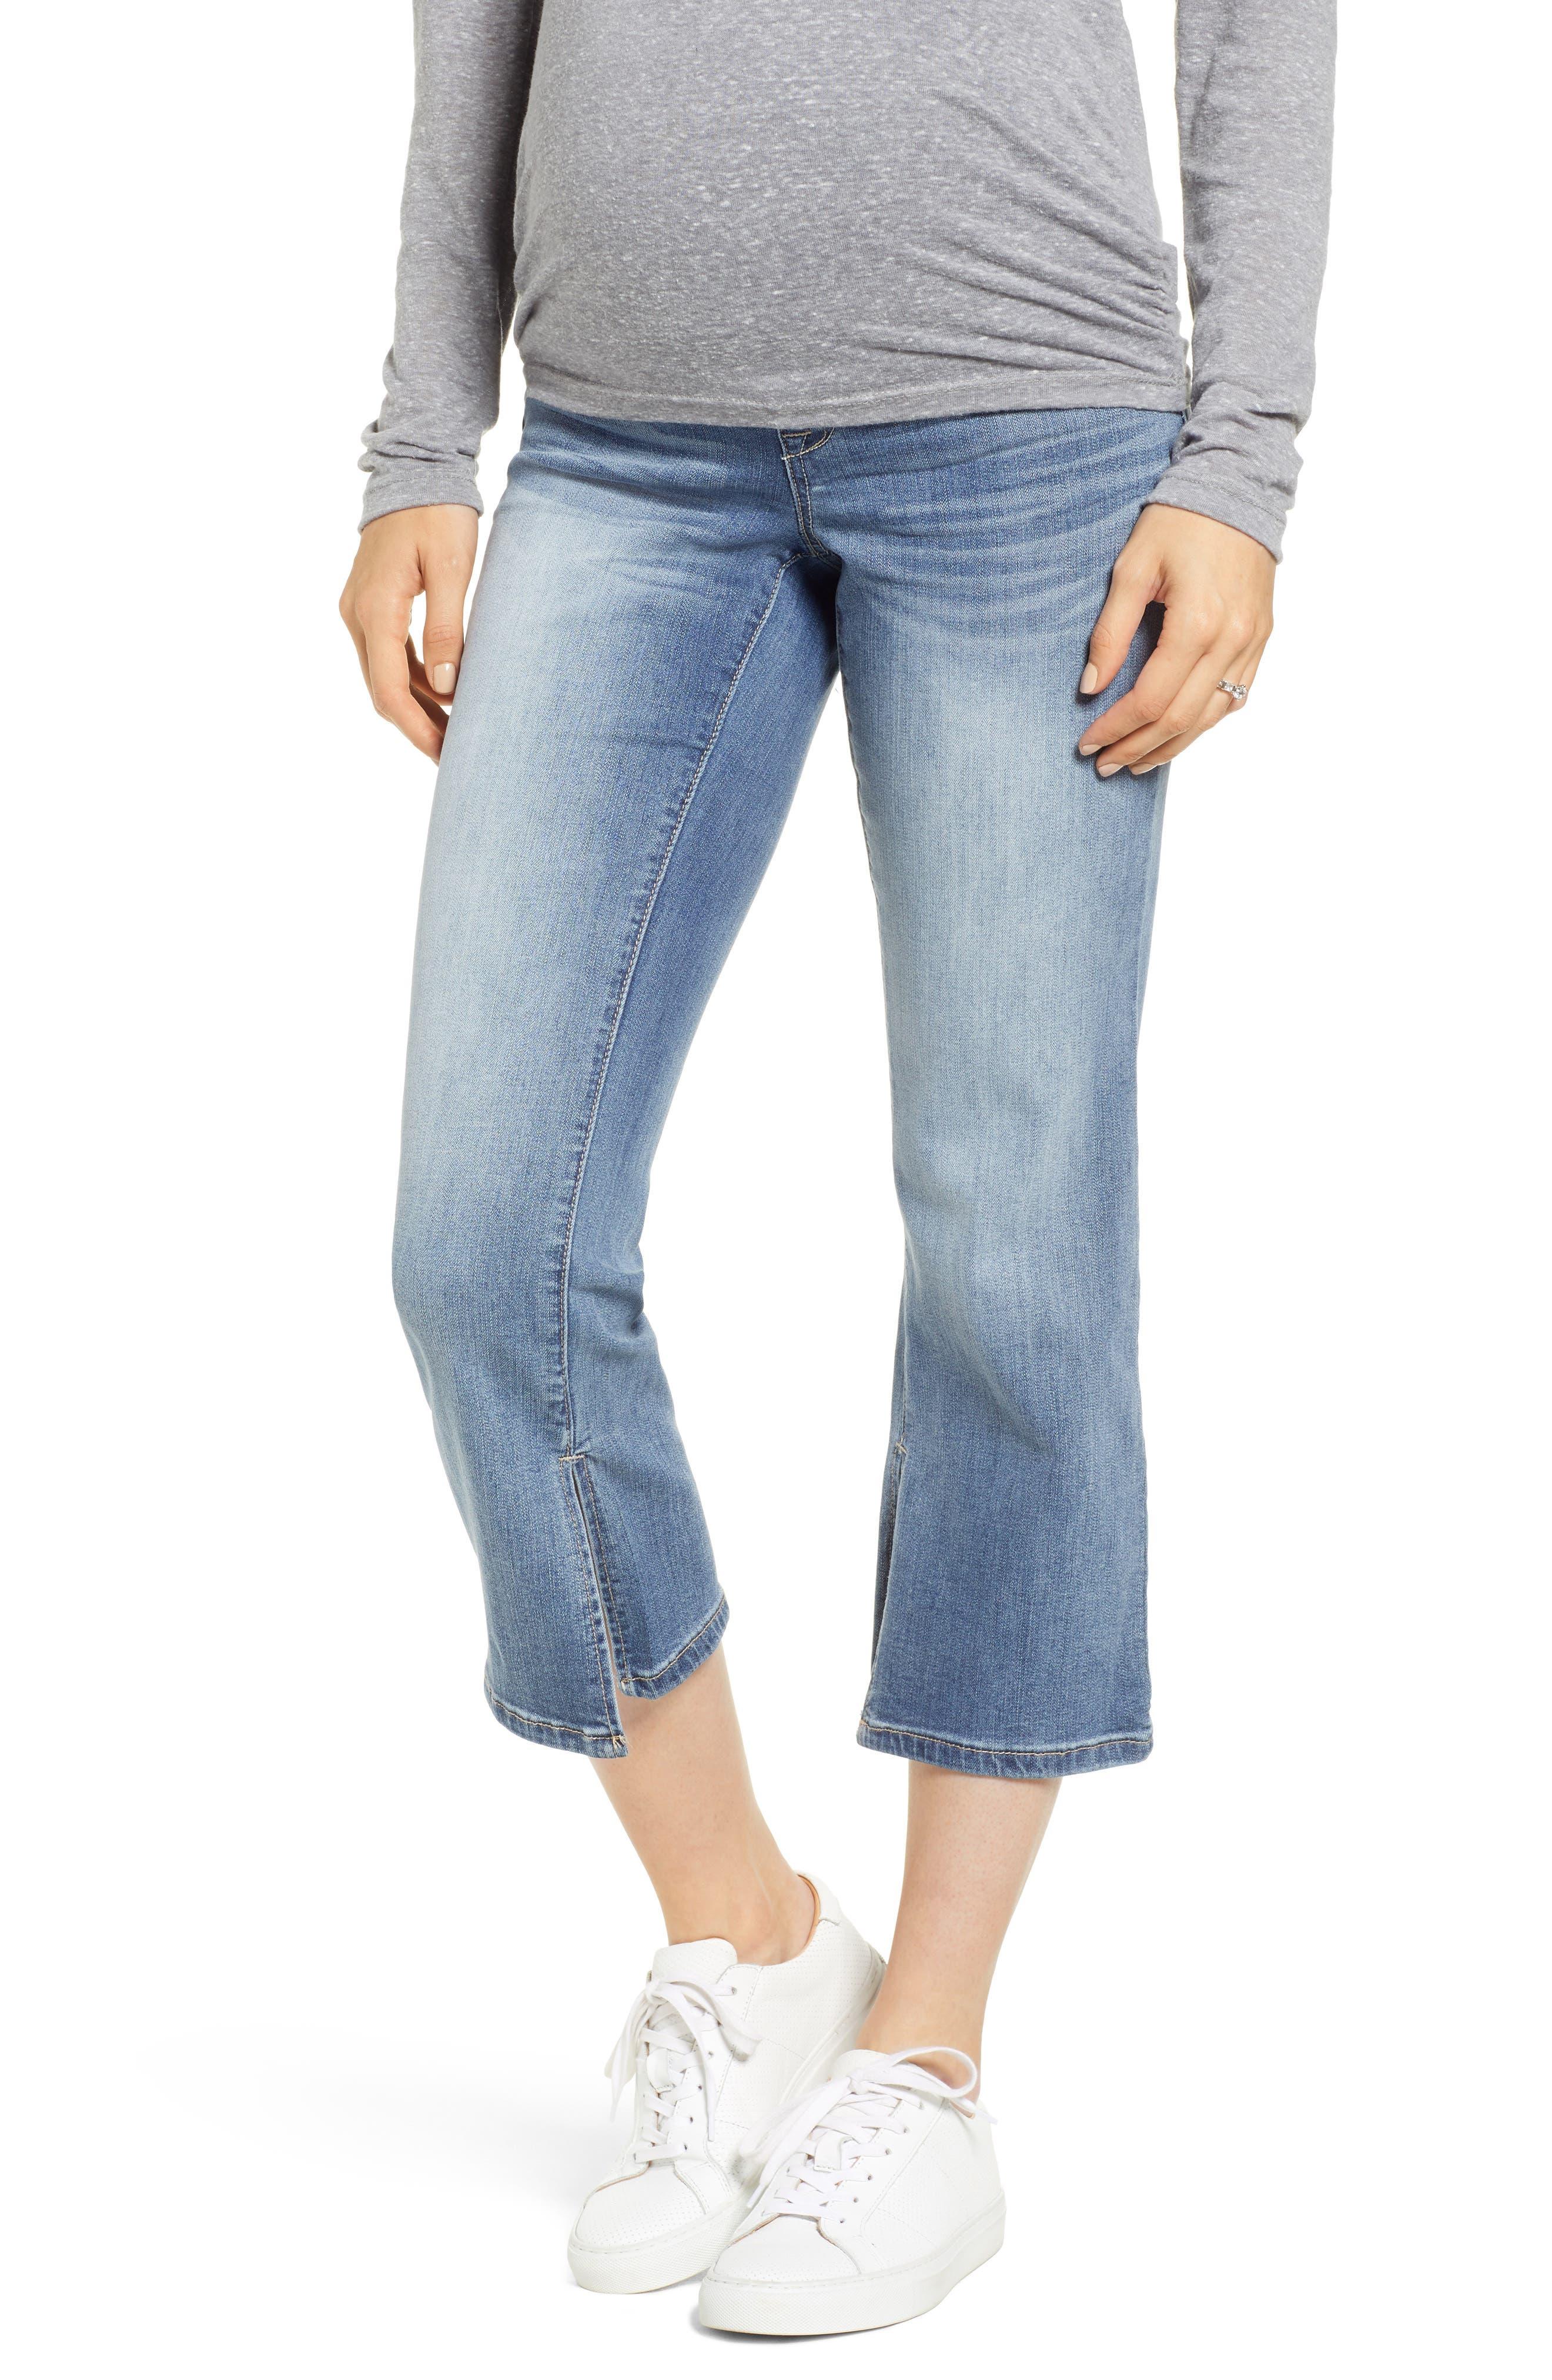 Women's 1822 Denim Slit Cuff Bootcut Maternity Jeans